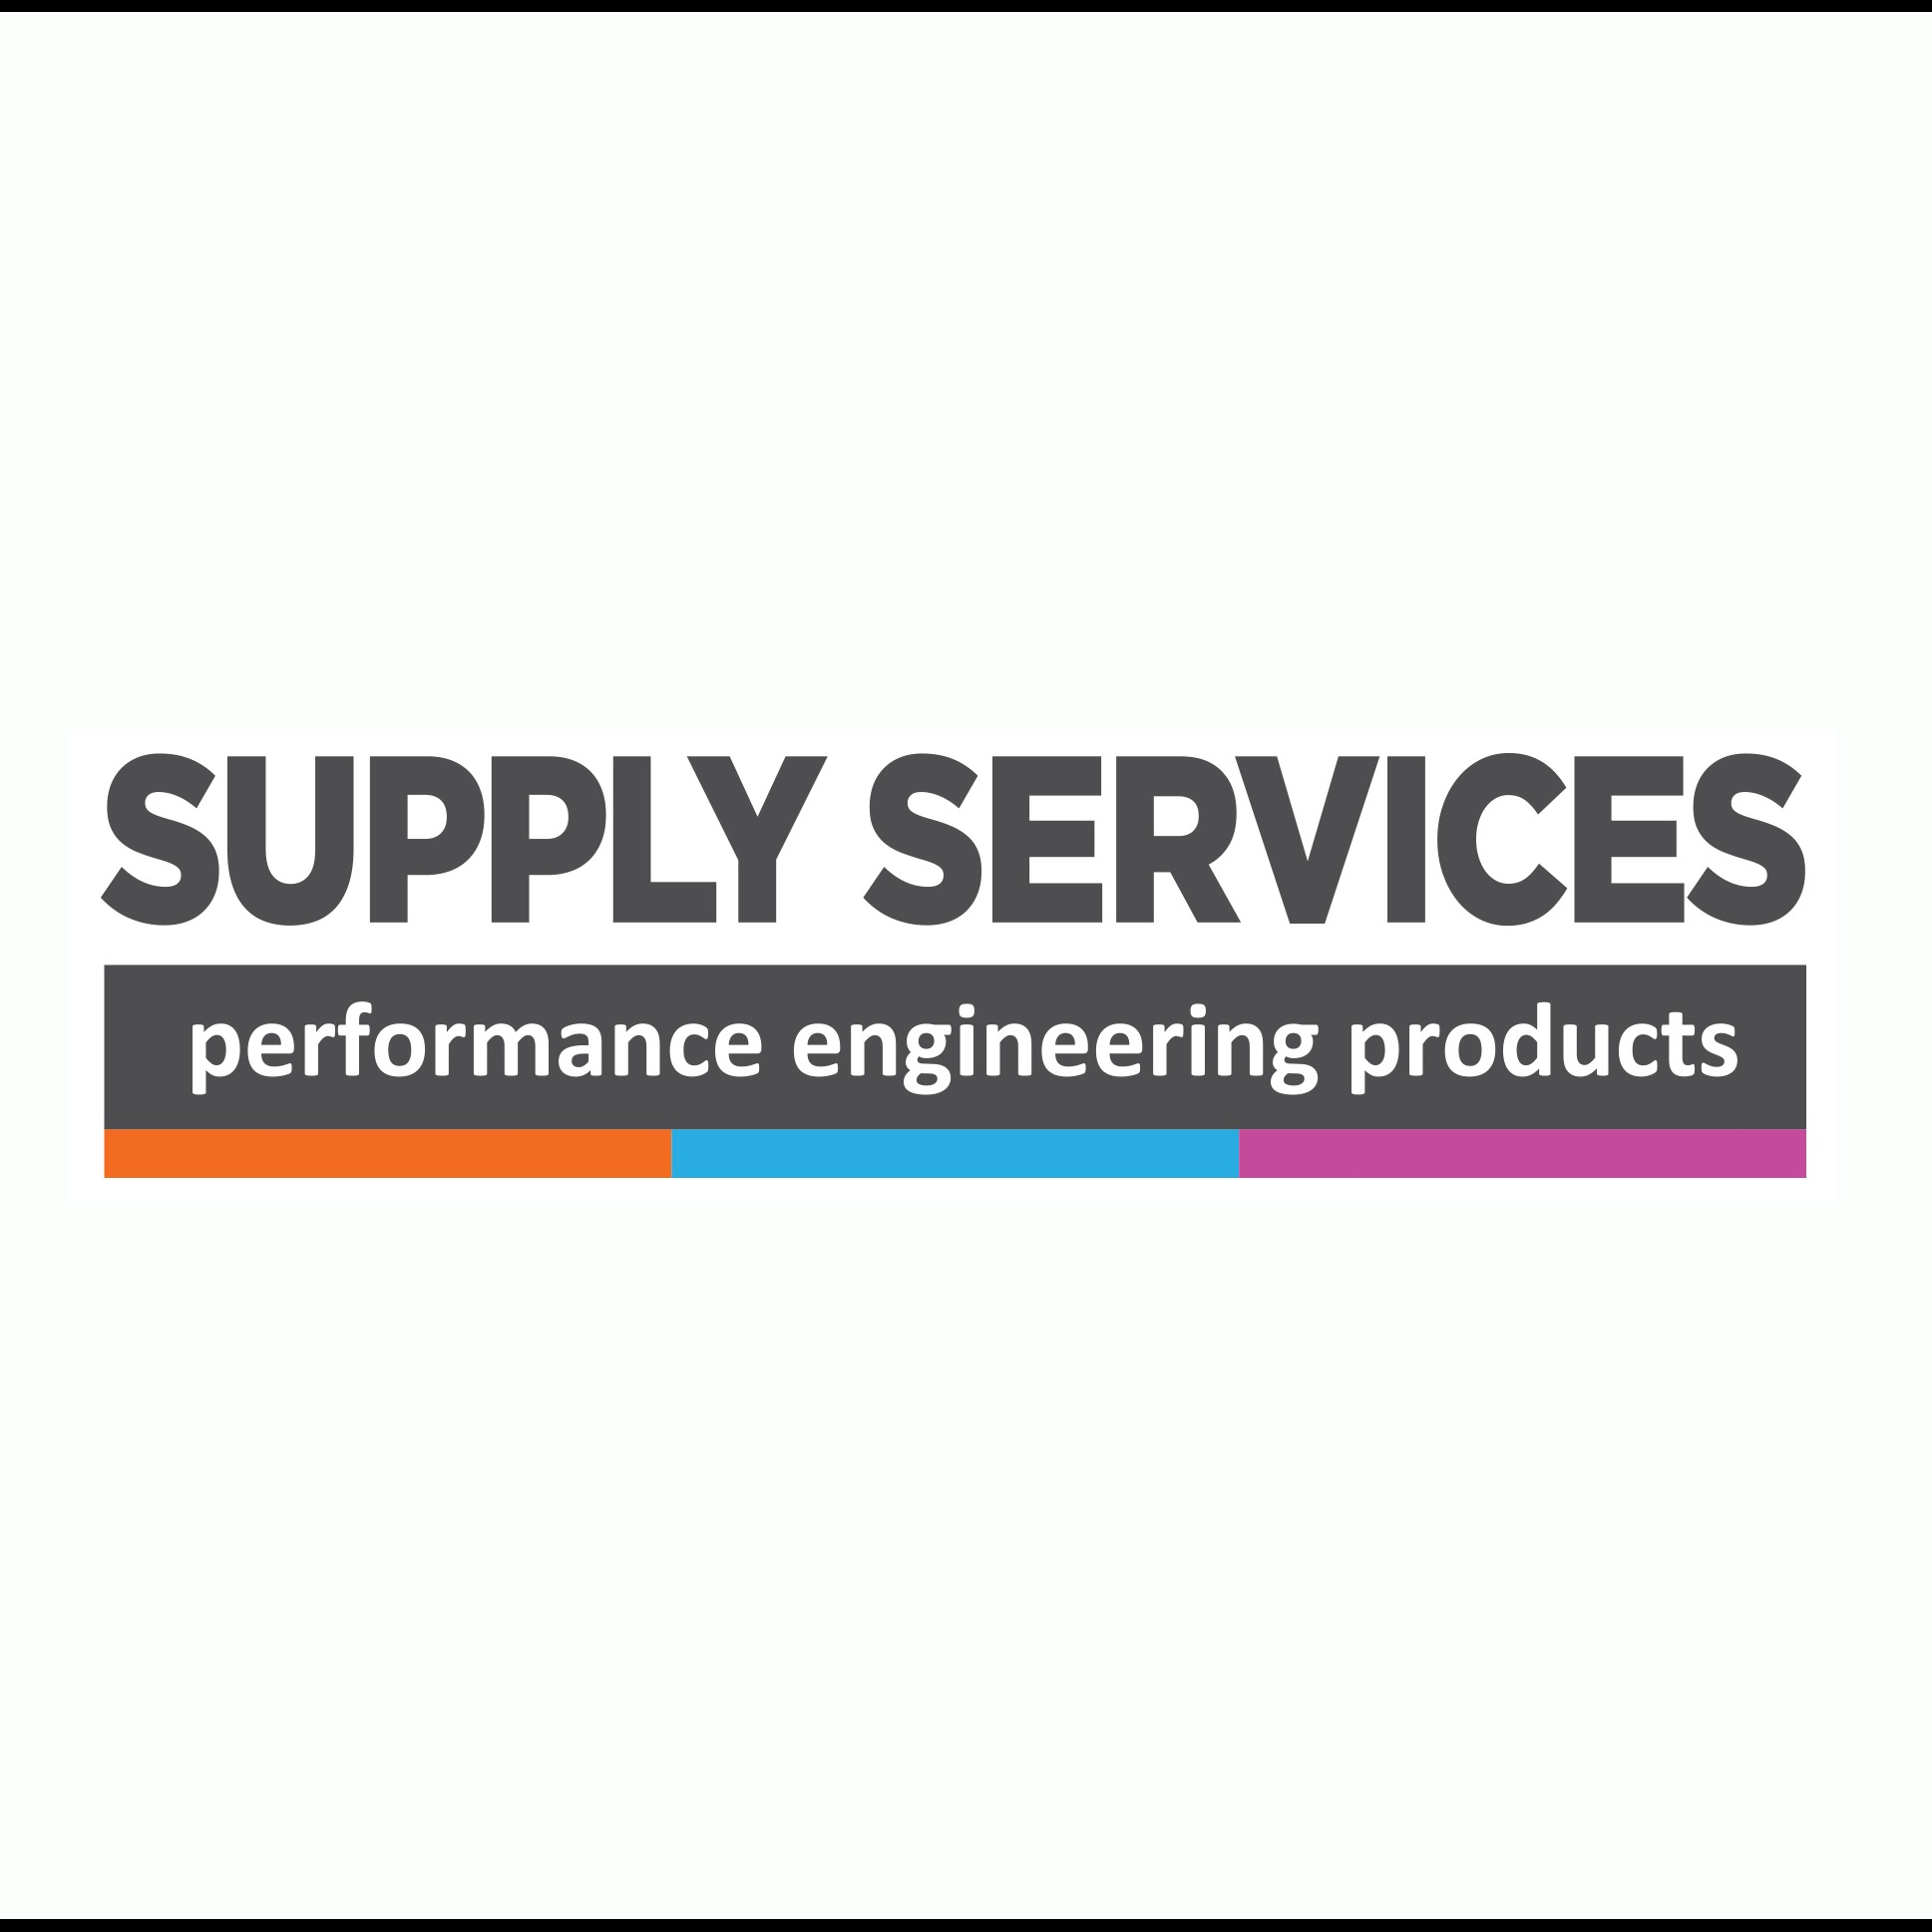 Supply Services Ltd